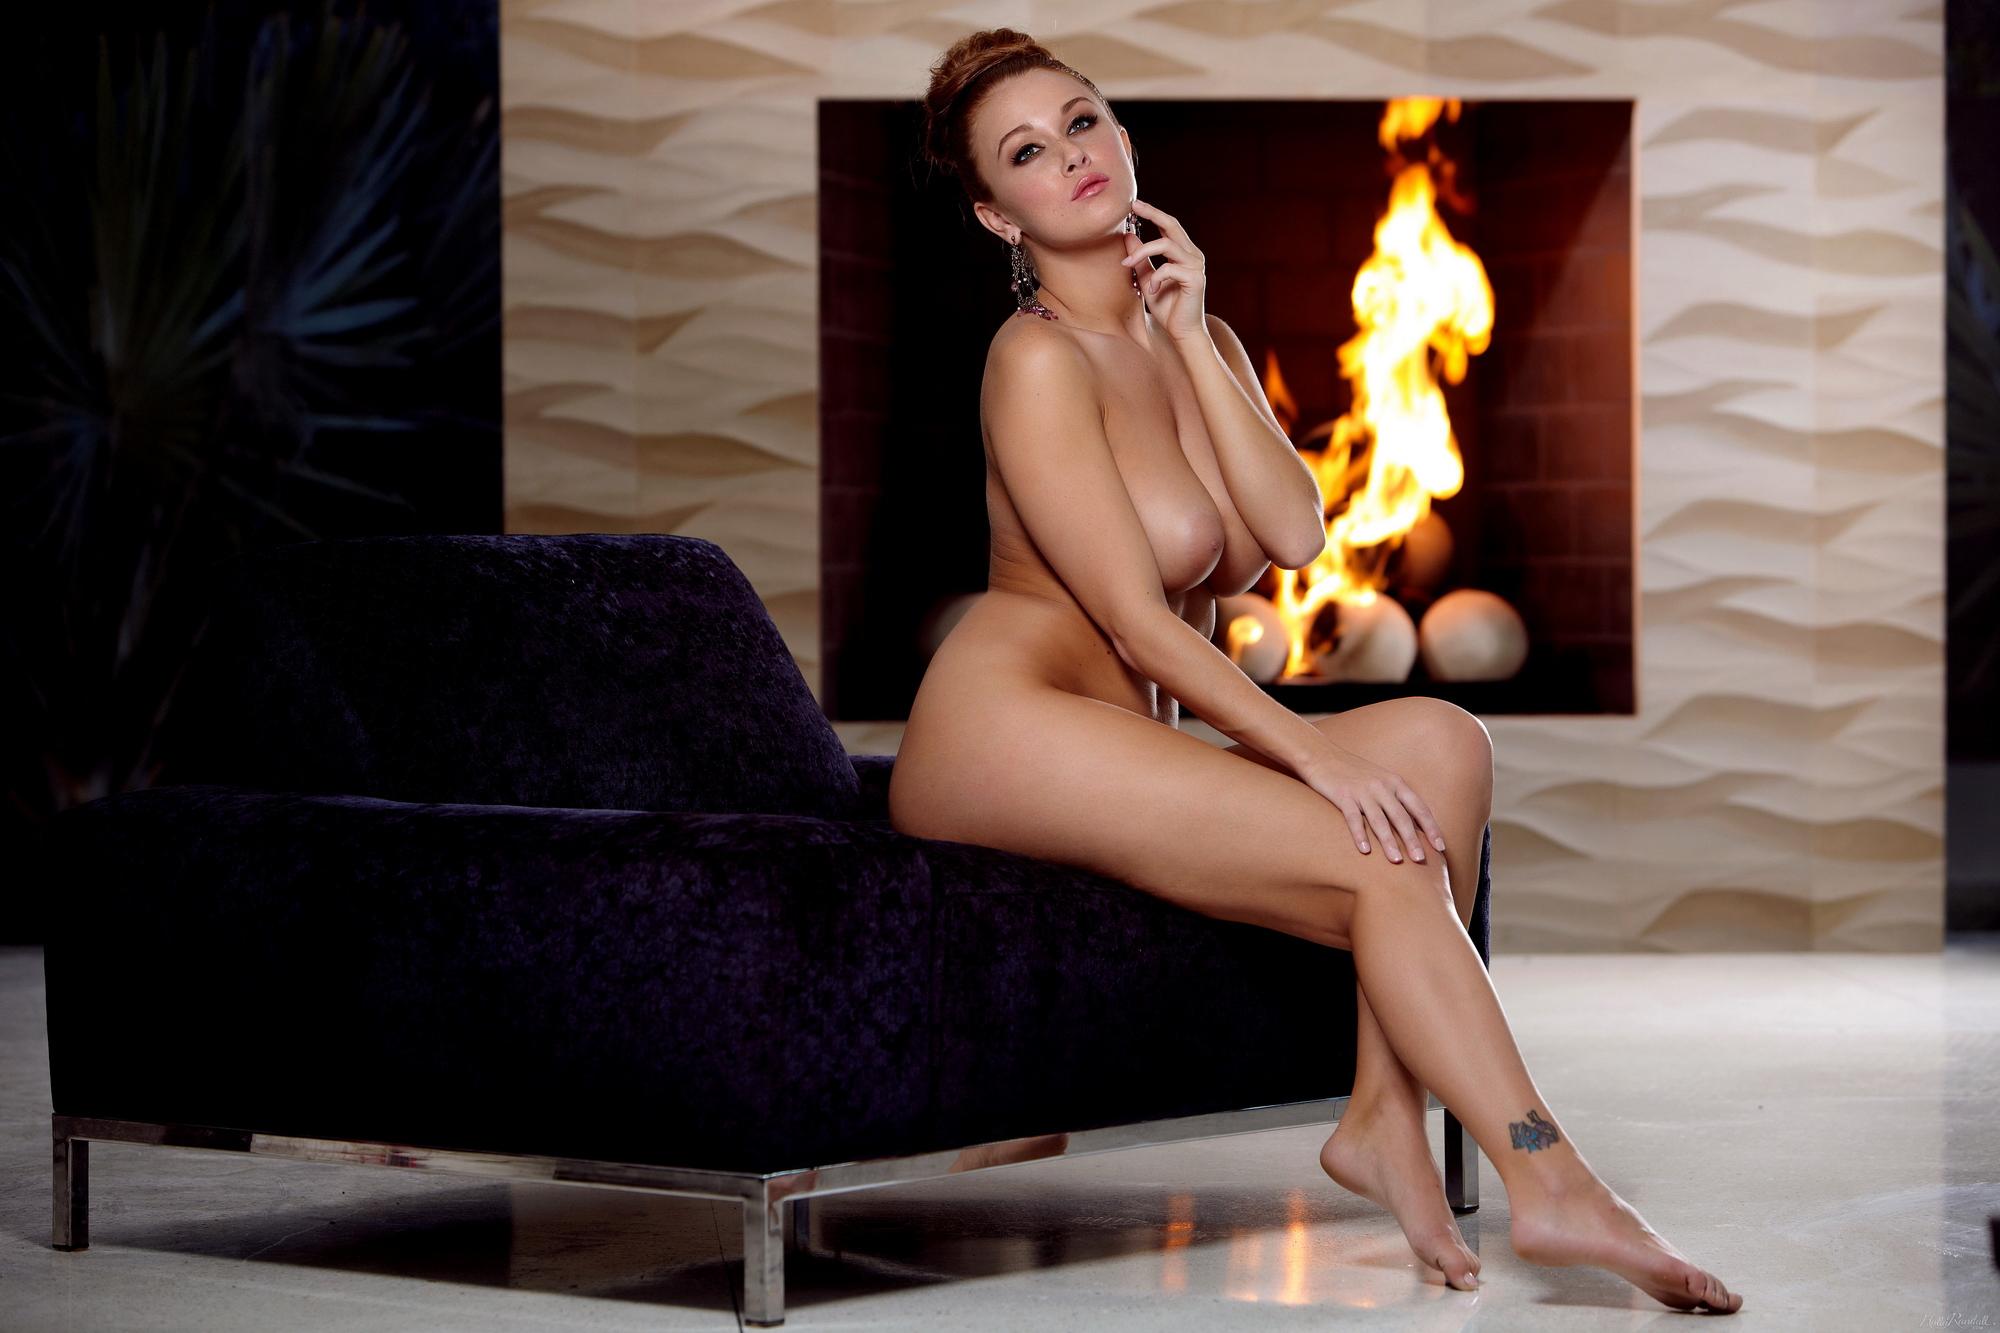 leanna-decker-nude-fireplace-redhead-hollyrandall-26